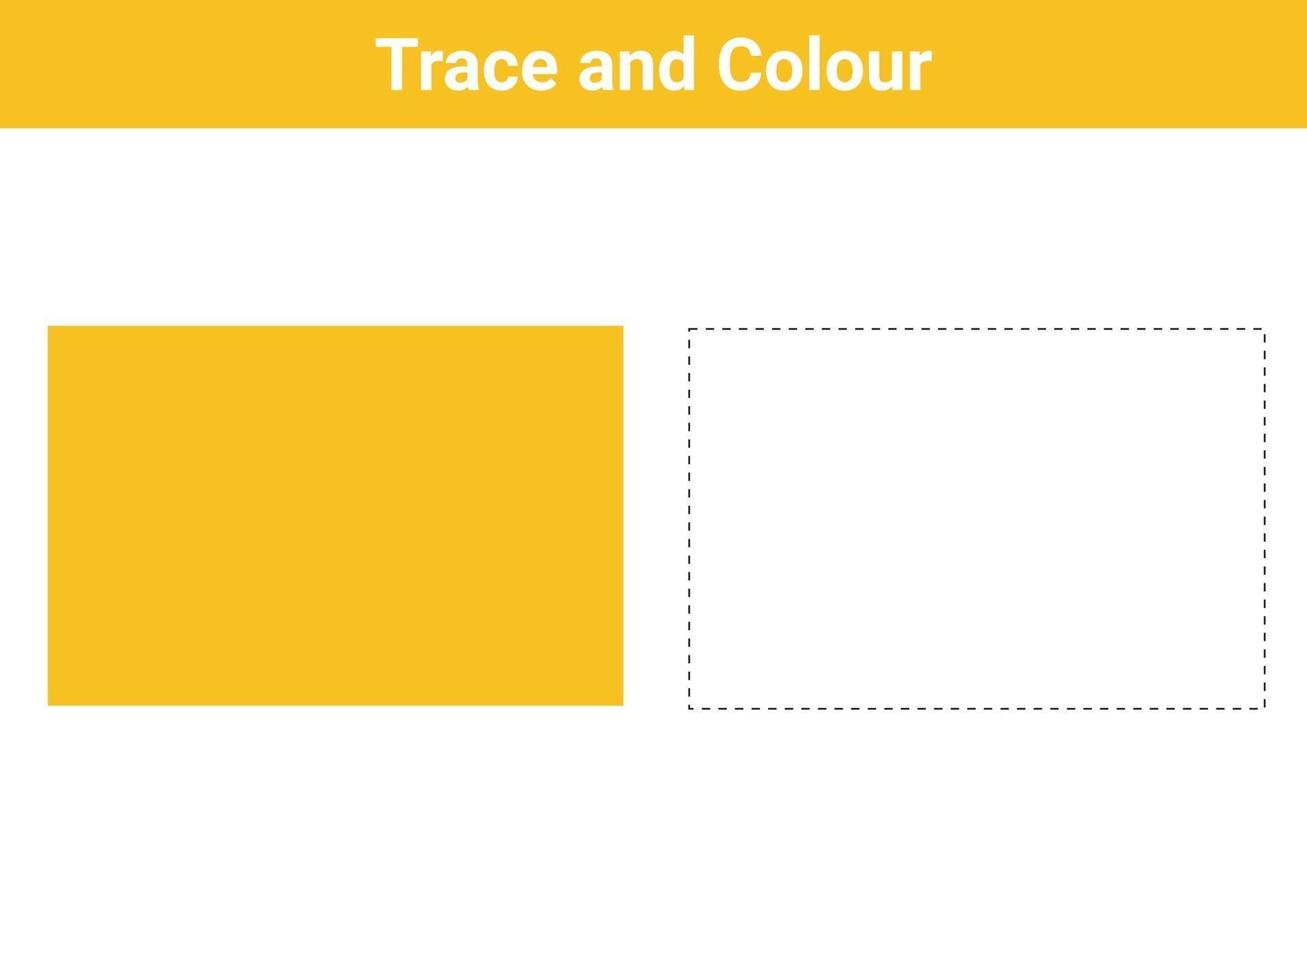 trace en kleur vierkante gratis vector